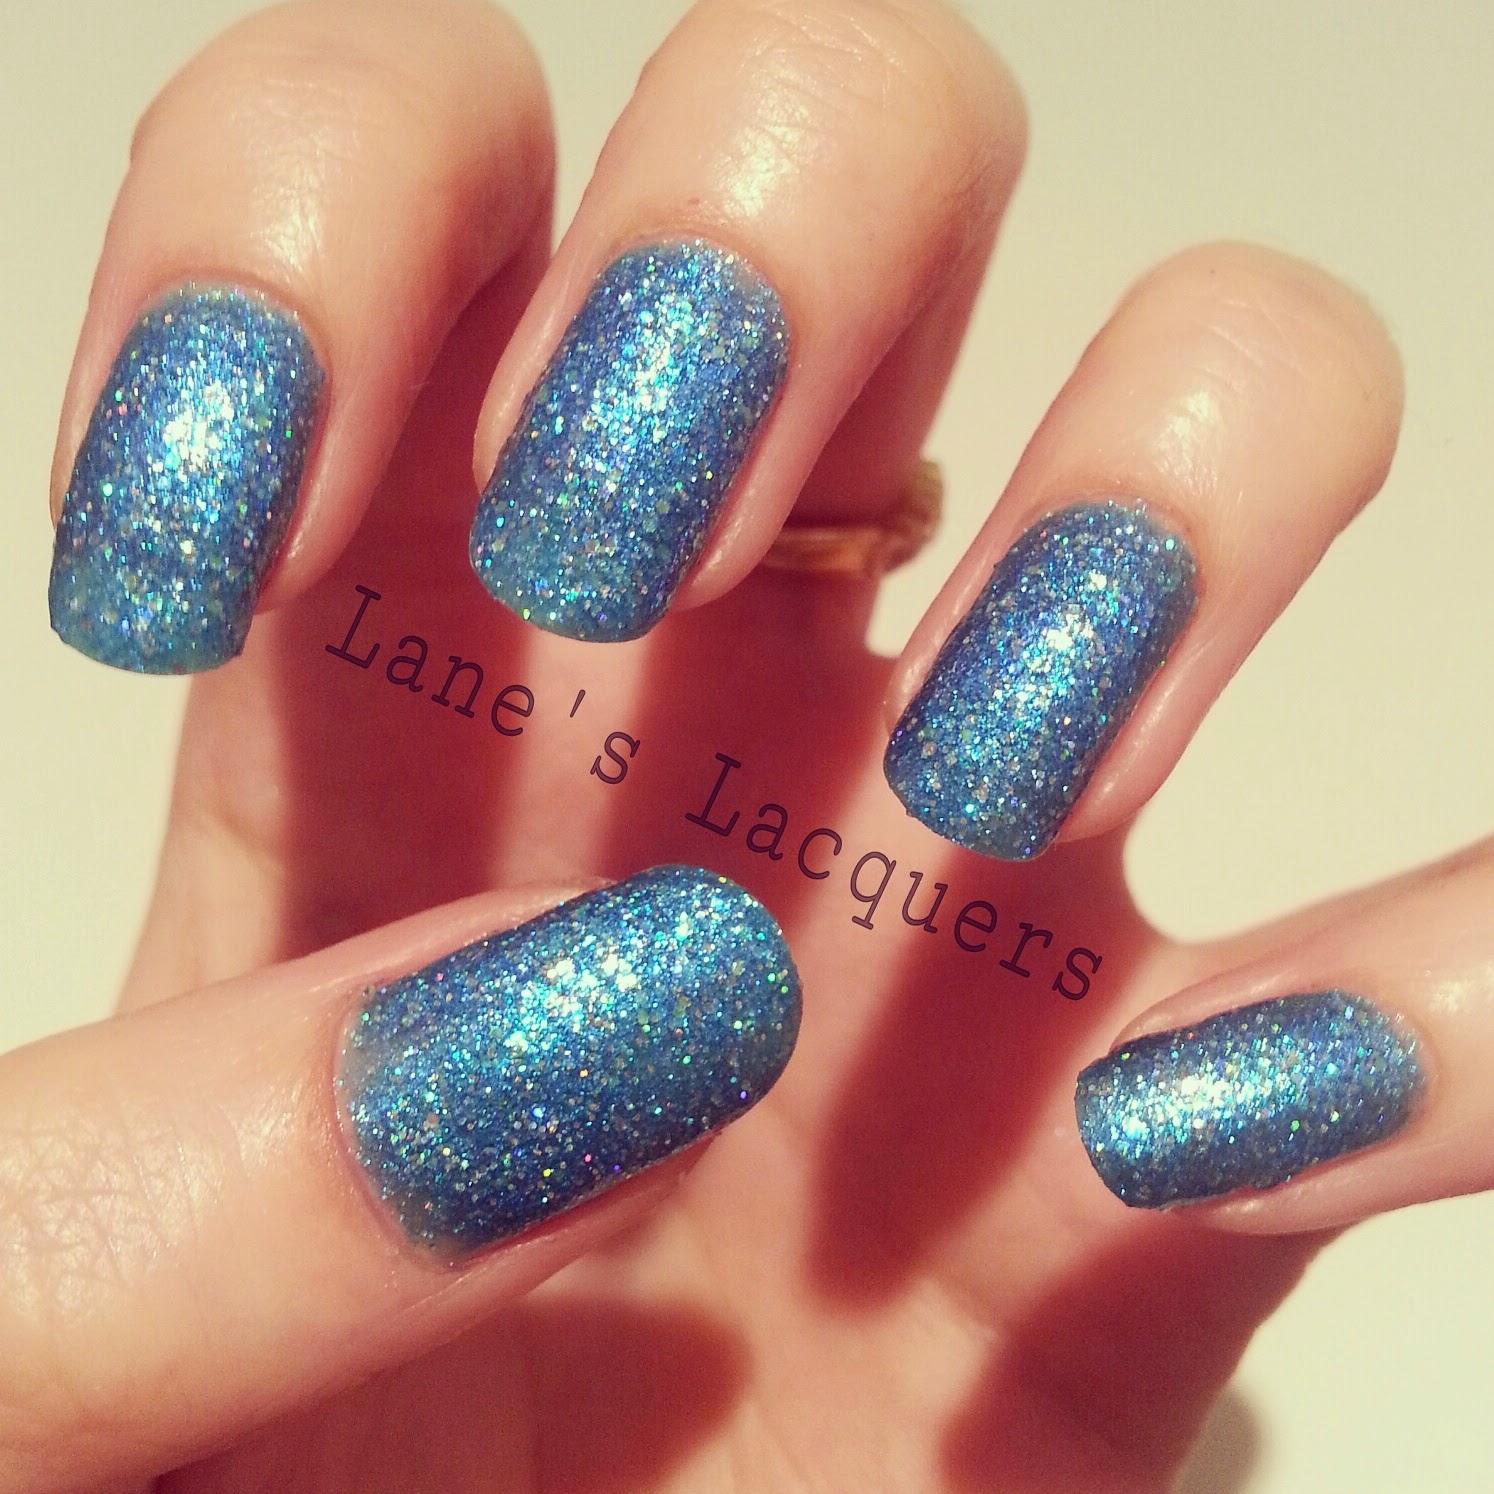 new-barry-m-glitterati-vip-swatch-manicure